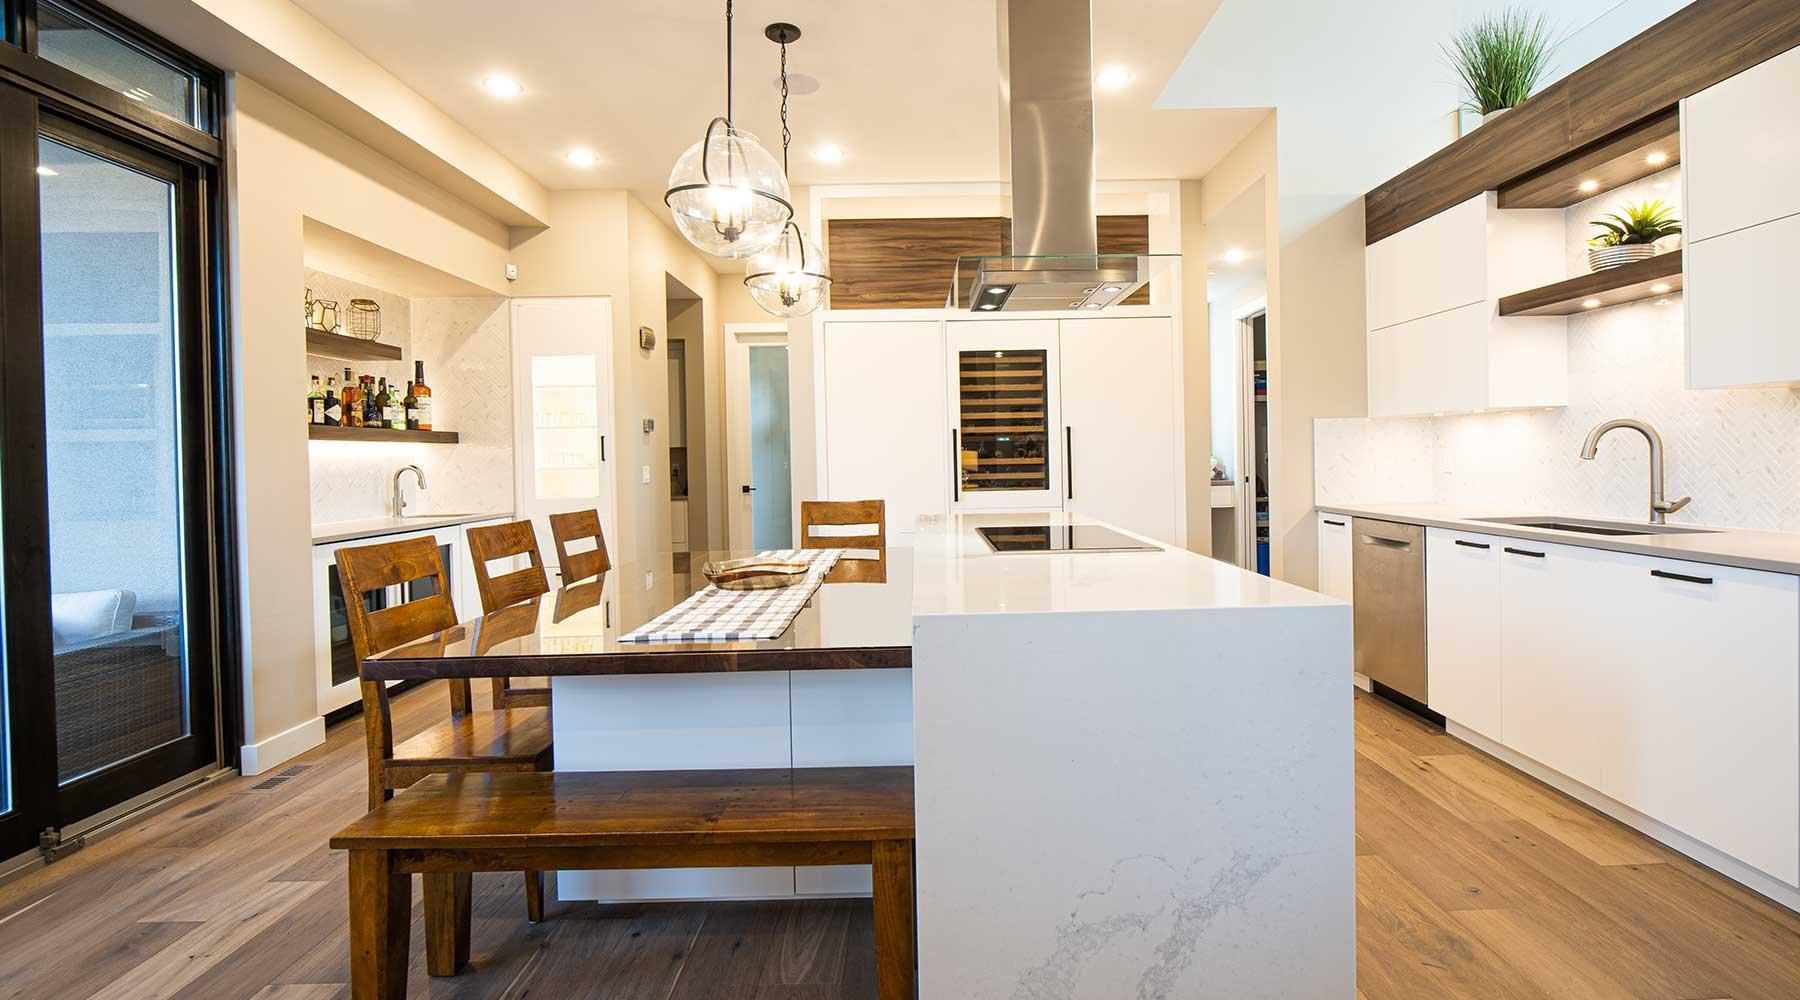 custom-luxury-home-builder-in-edmonton-home-built-by-kanvi-homes-slide2